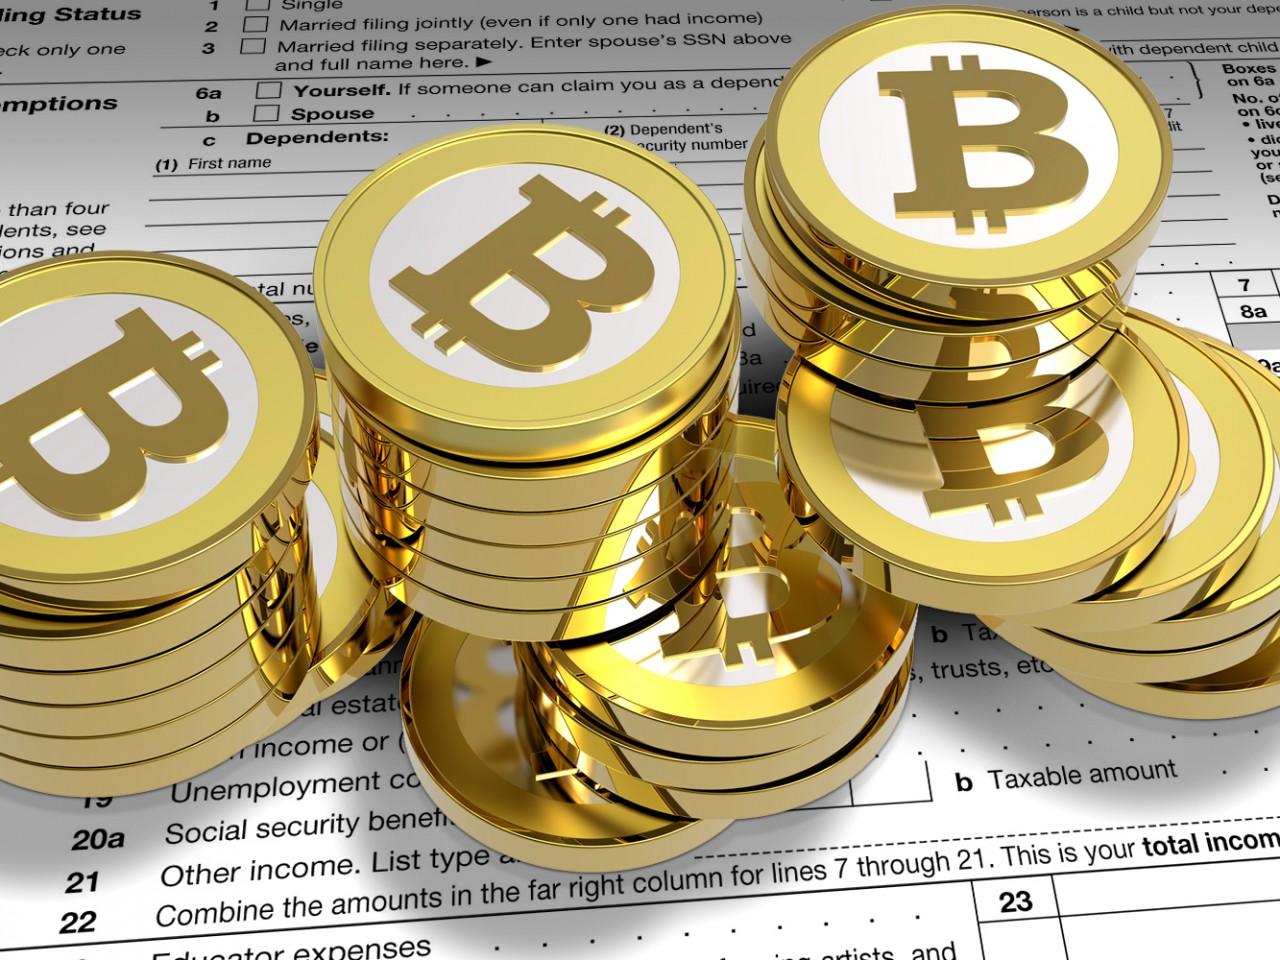 carta btc trading online consob